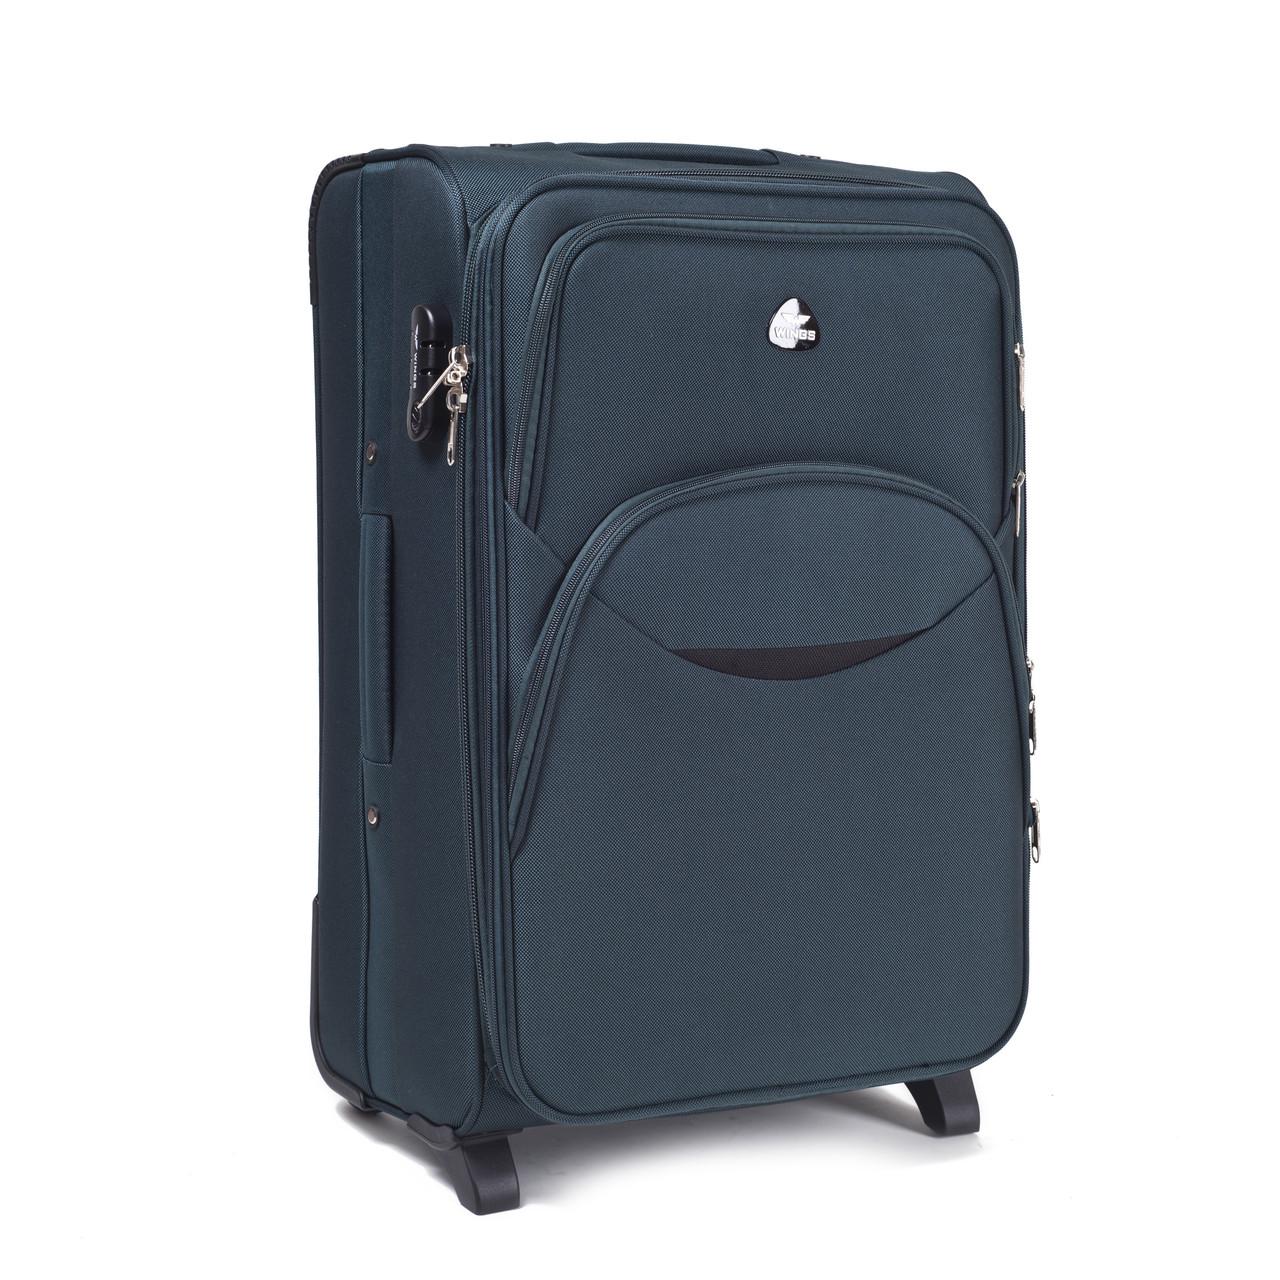 Малый тканевый чемодан Wings 1708 на 2 колесах зеленый